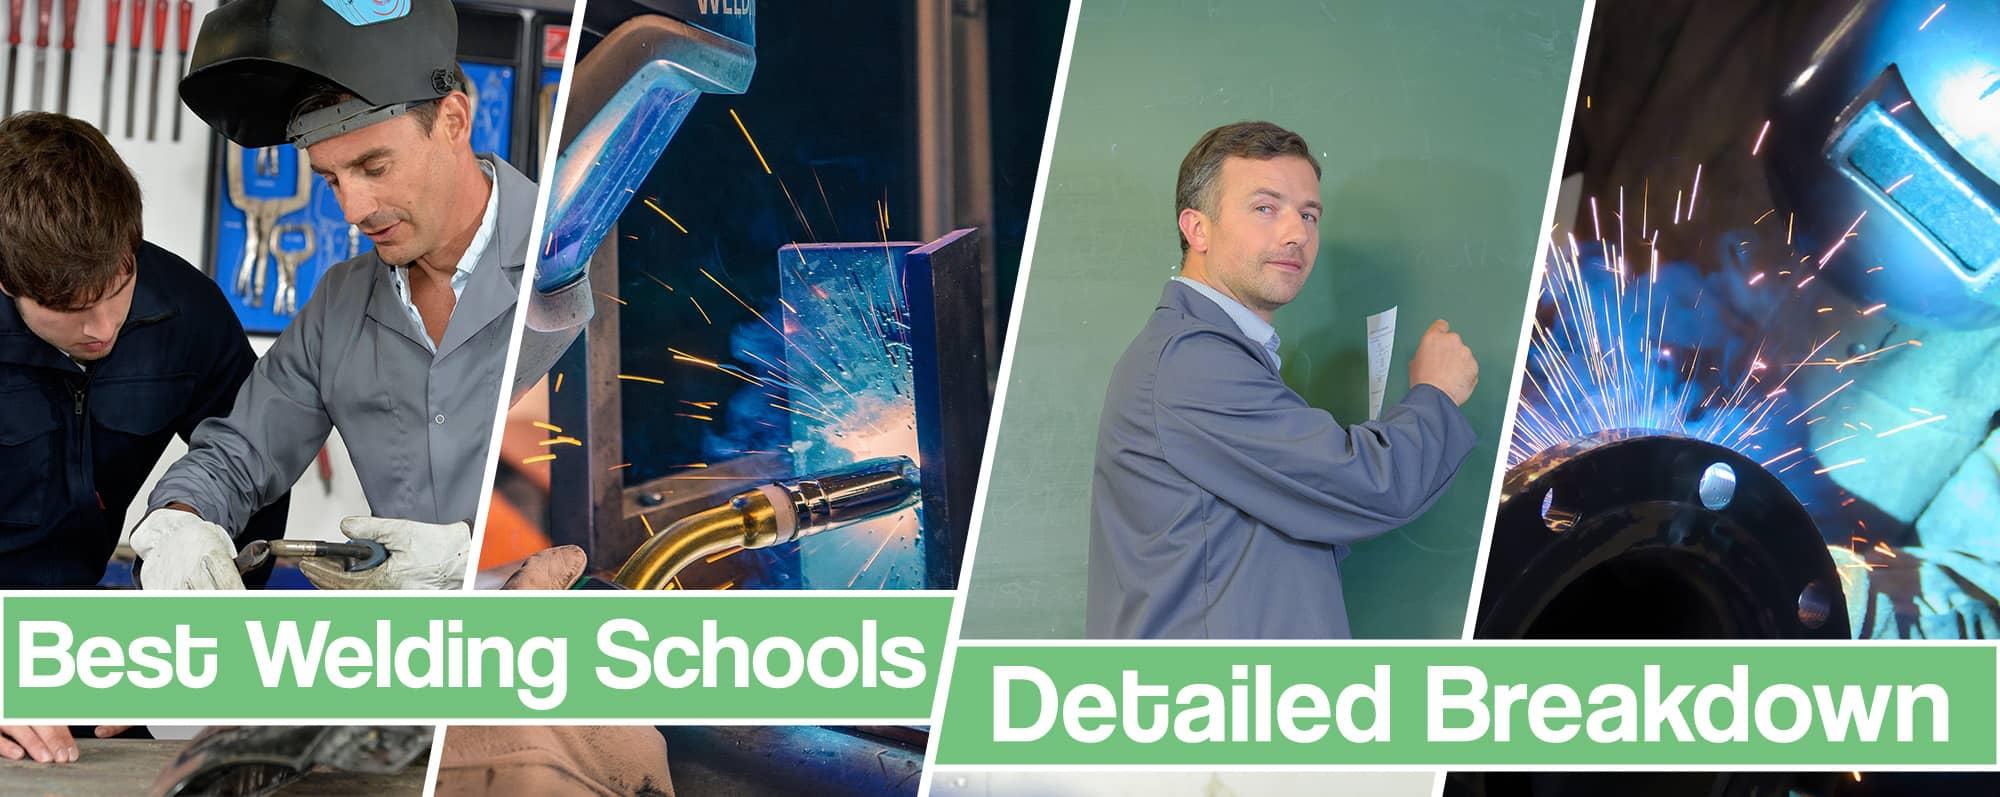 Feature image for Best Welding Schools article